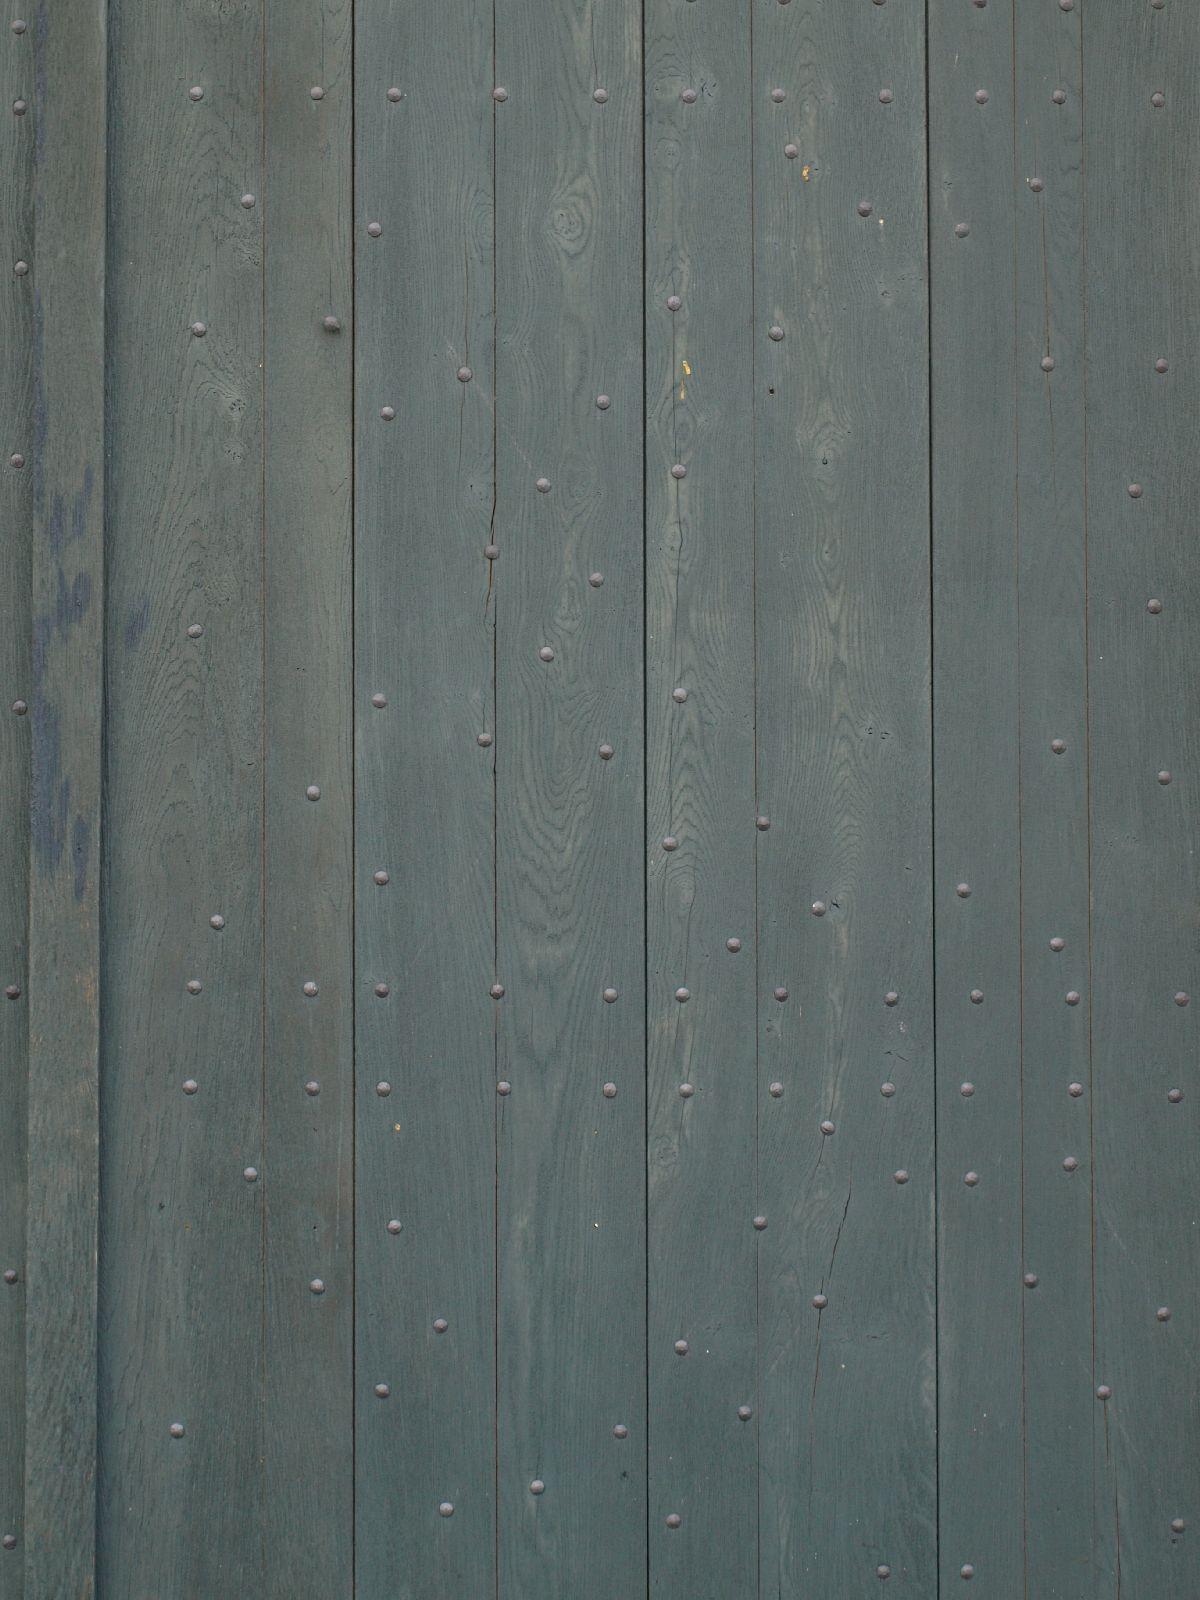 Wood_Texture_A_P4171310